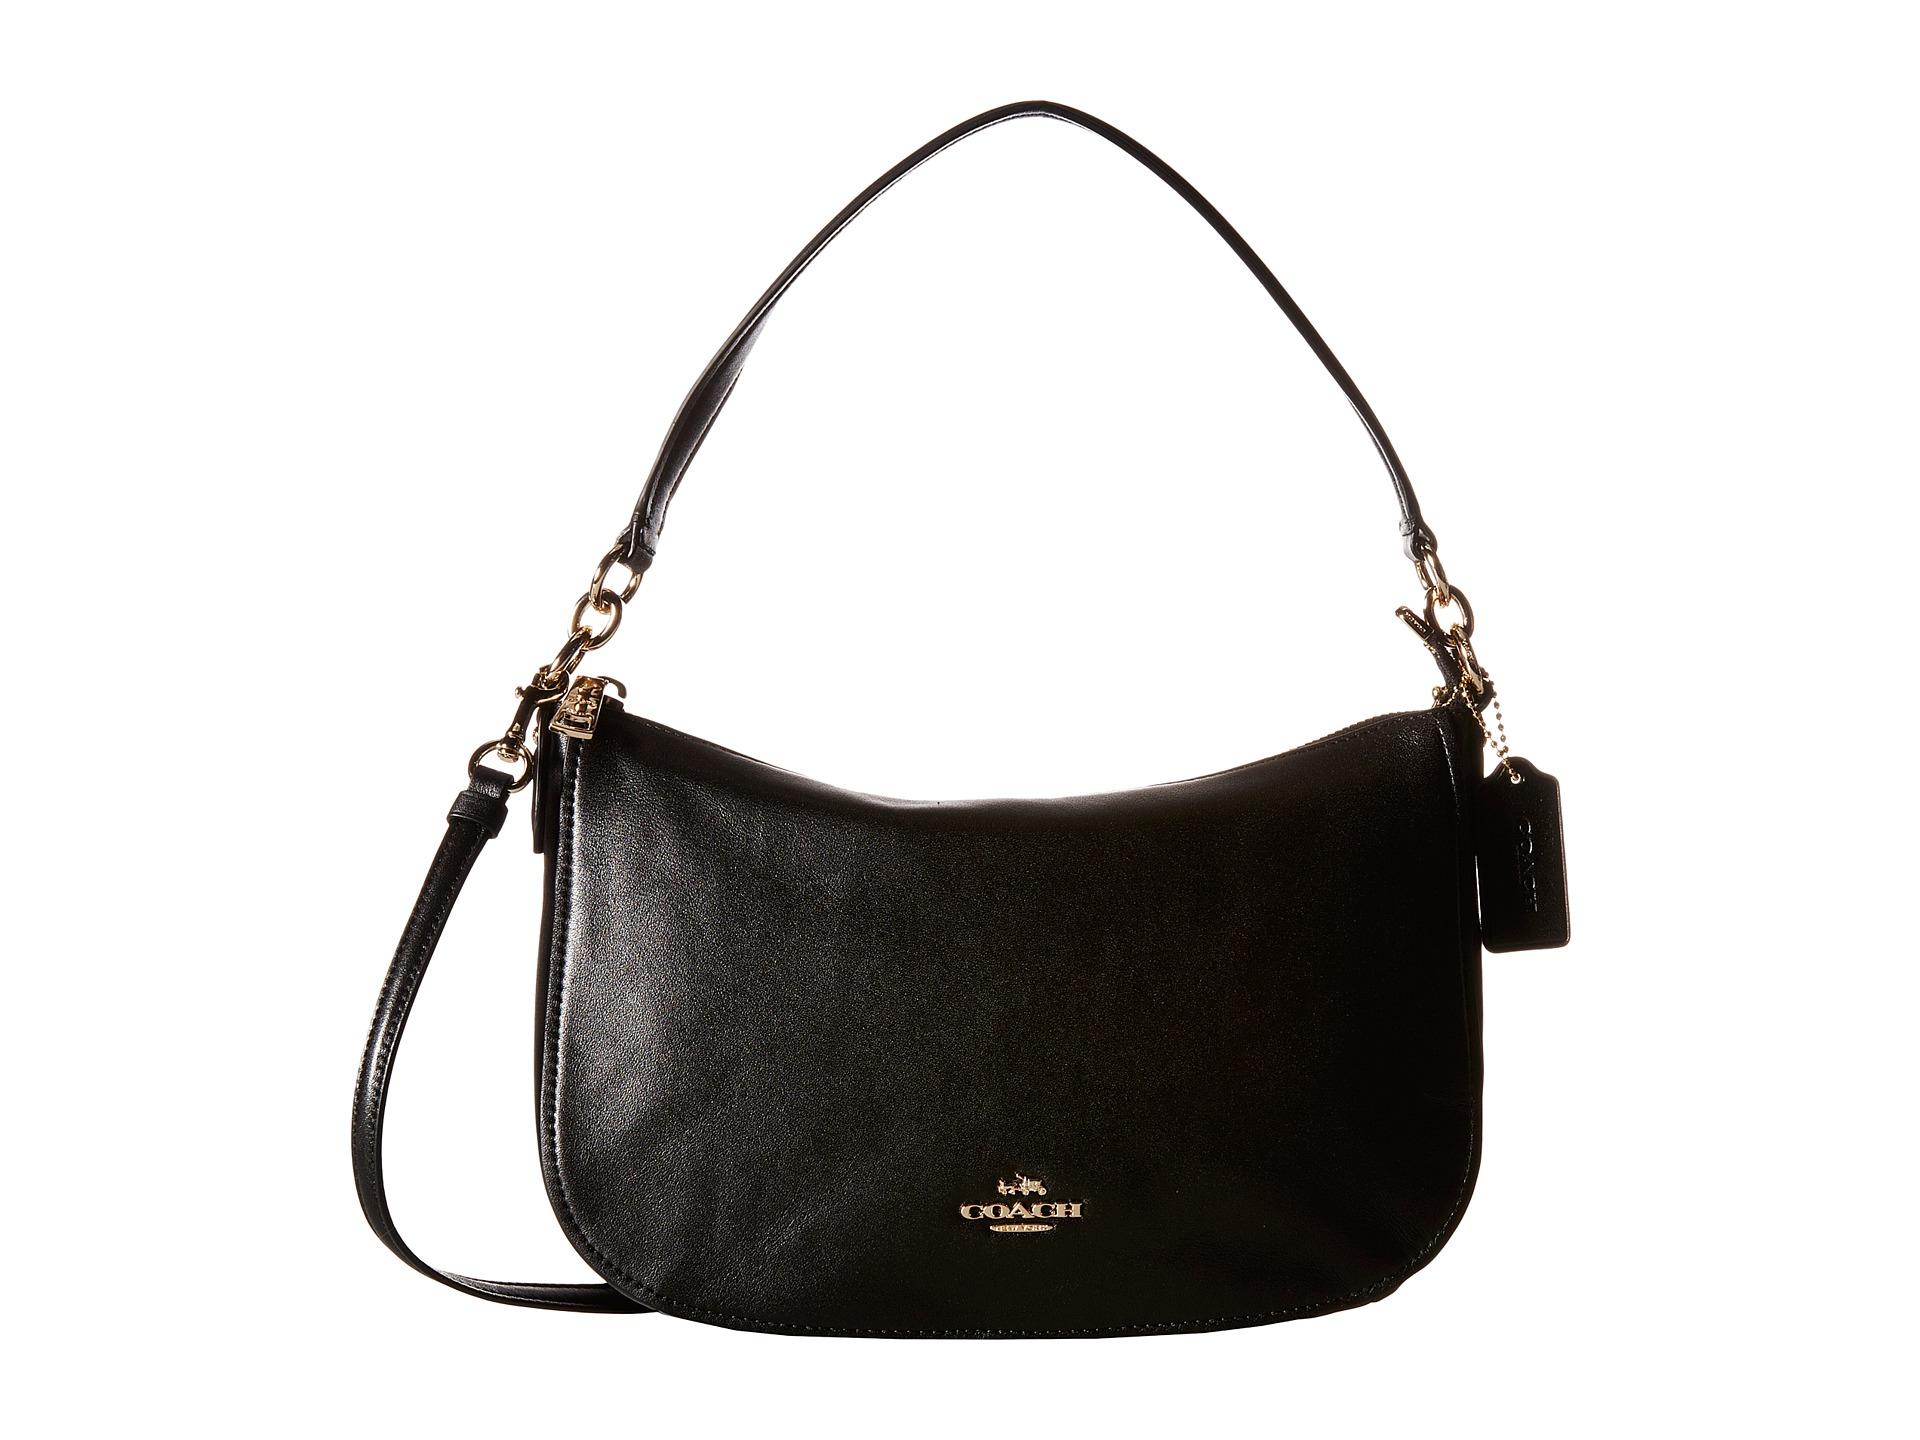 Chelsea Crossbody Bag in Black Calfskin Coach bryO5l